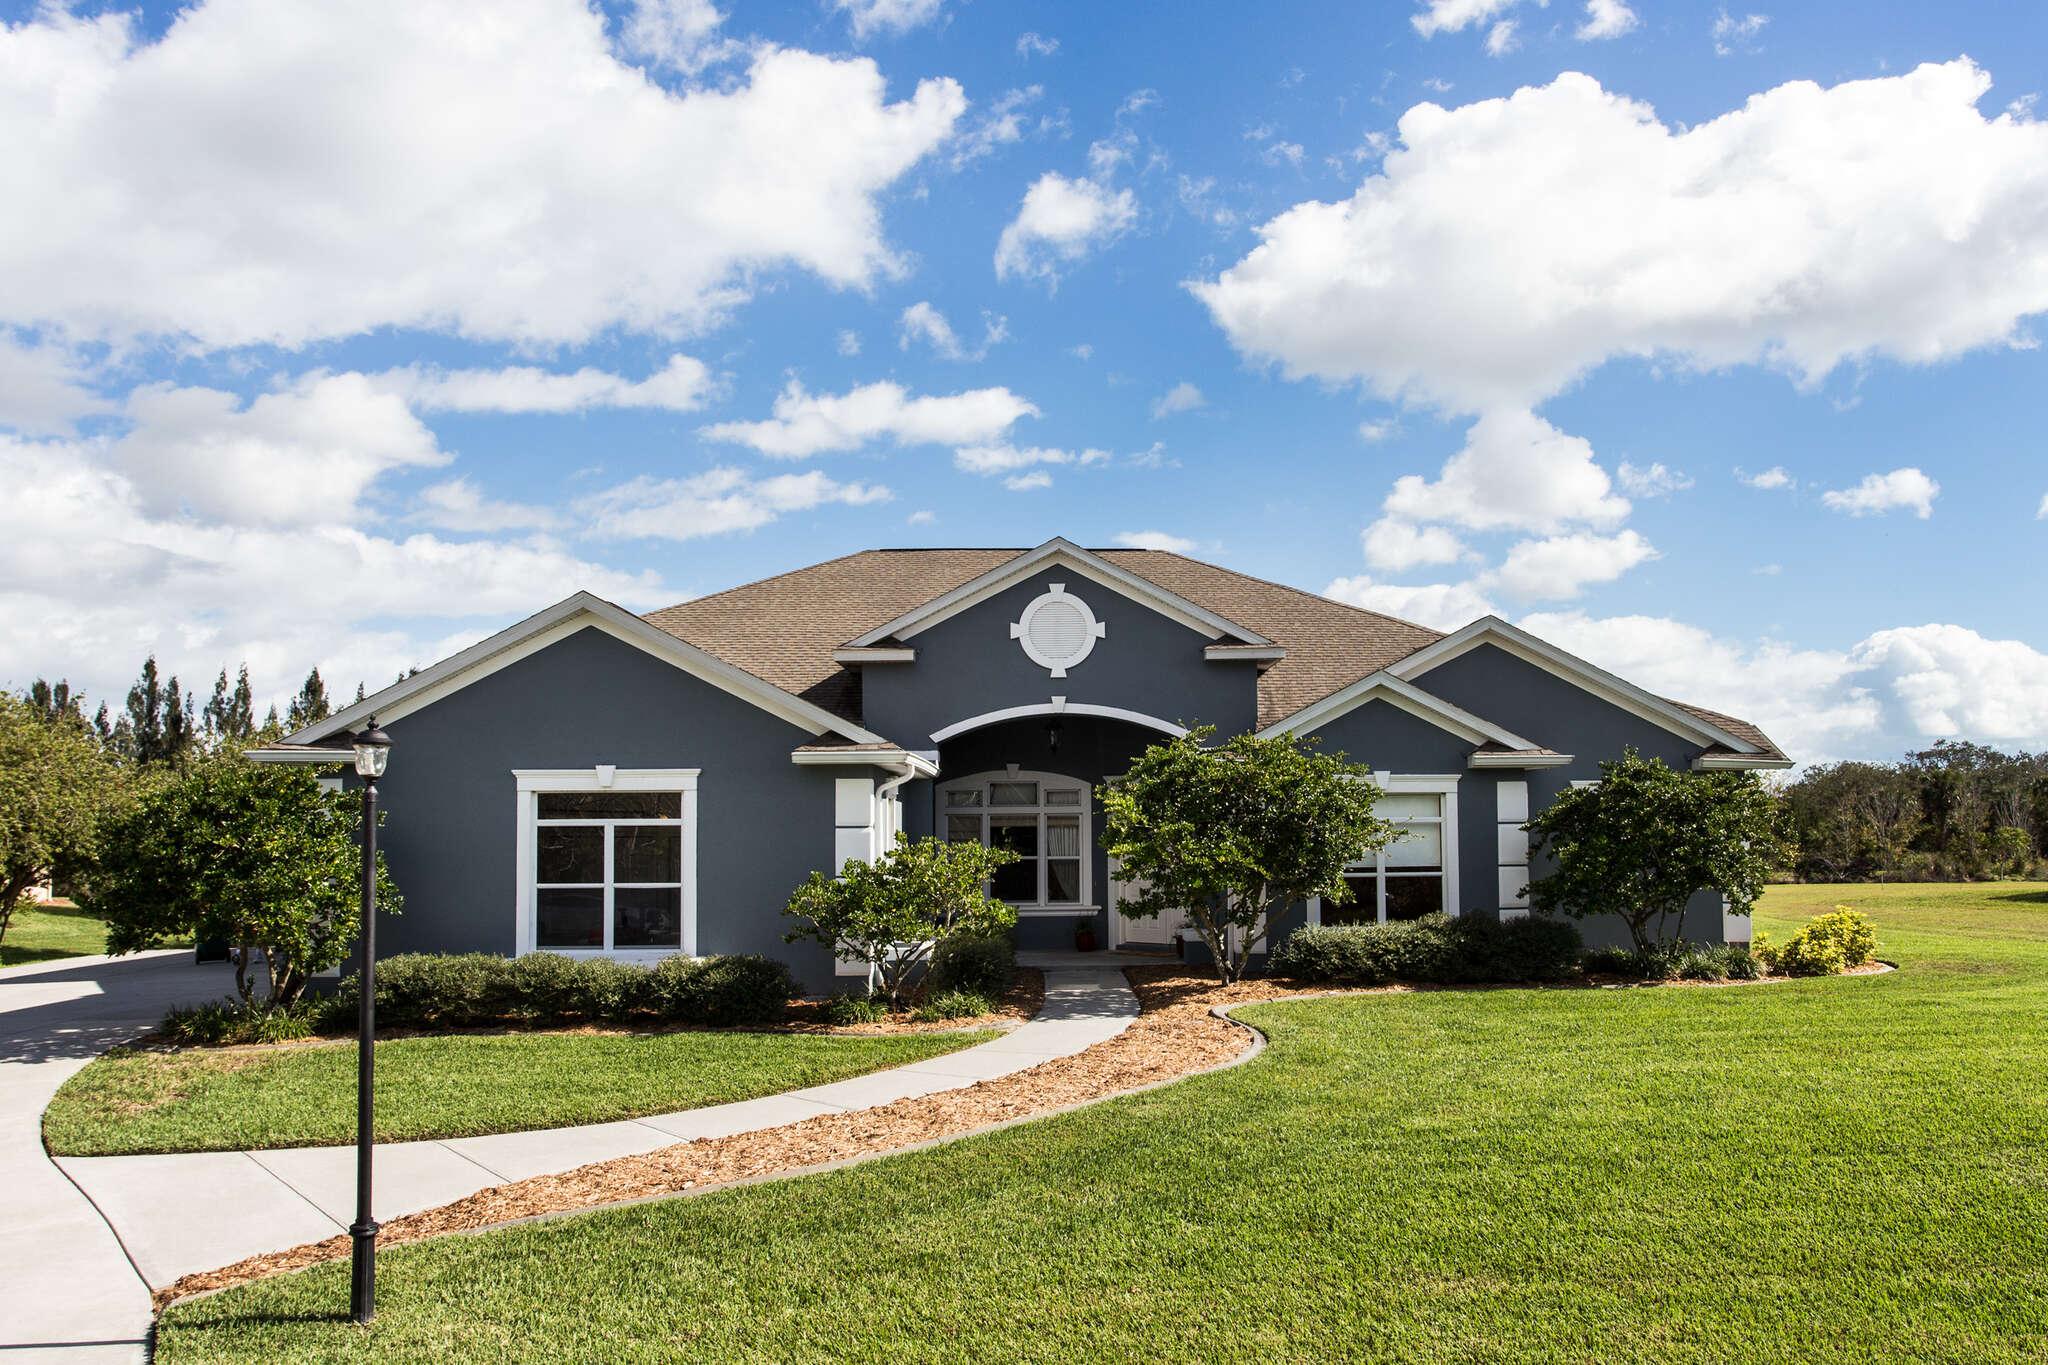 Single Family for Sale at 5347 Royal Paddock Way Merritt Island, Florida 32953 United States